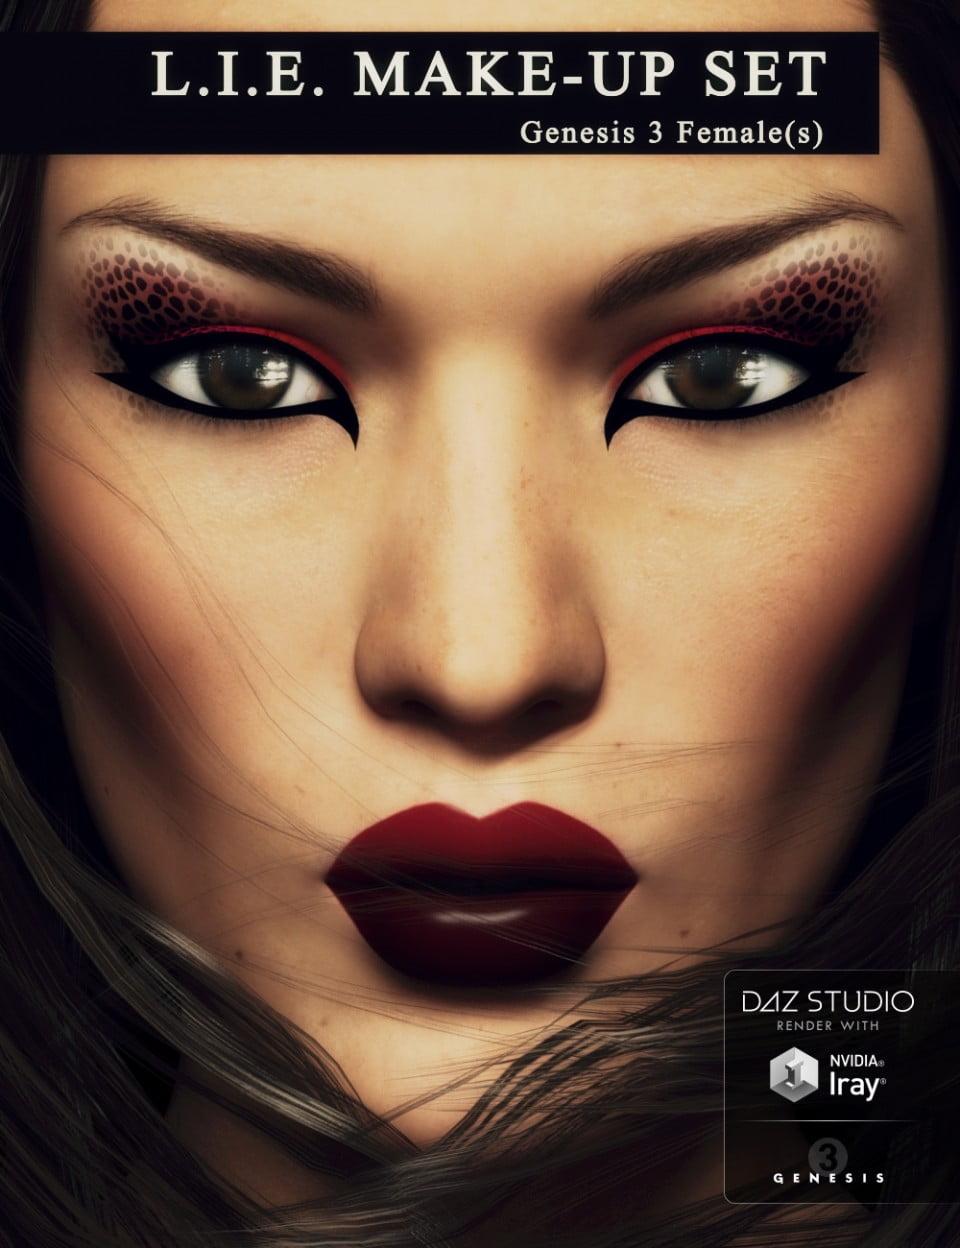 L.I.E Make-up Set for Genesis 3 Female(s)